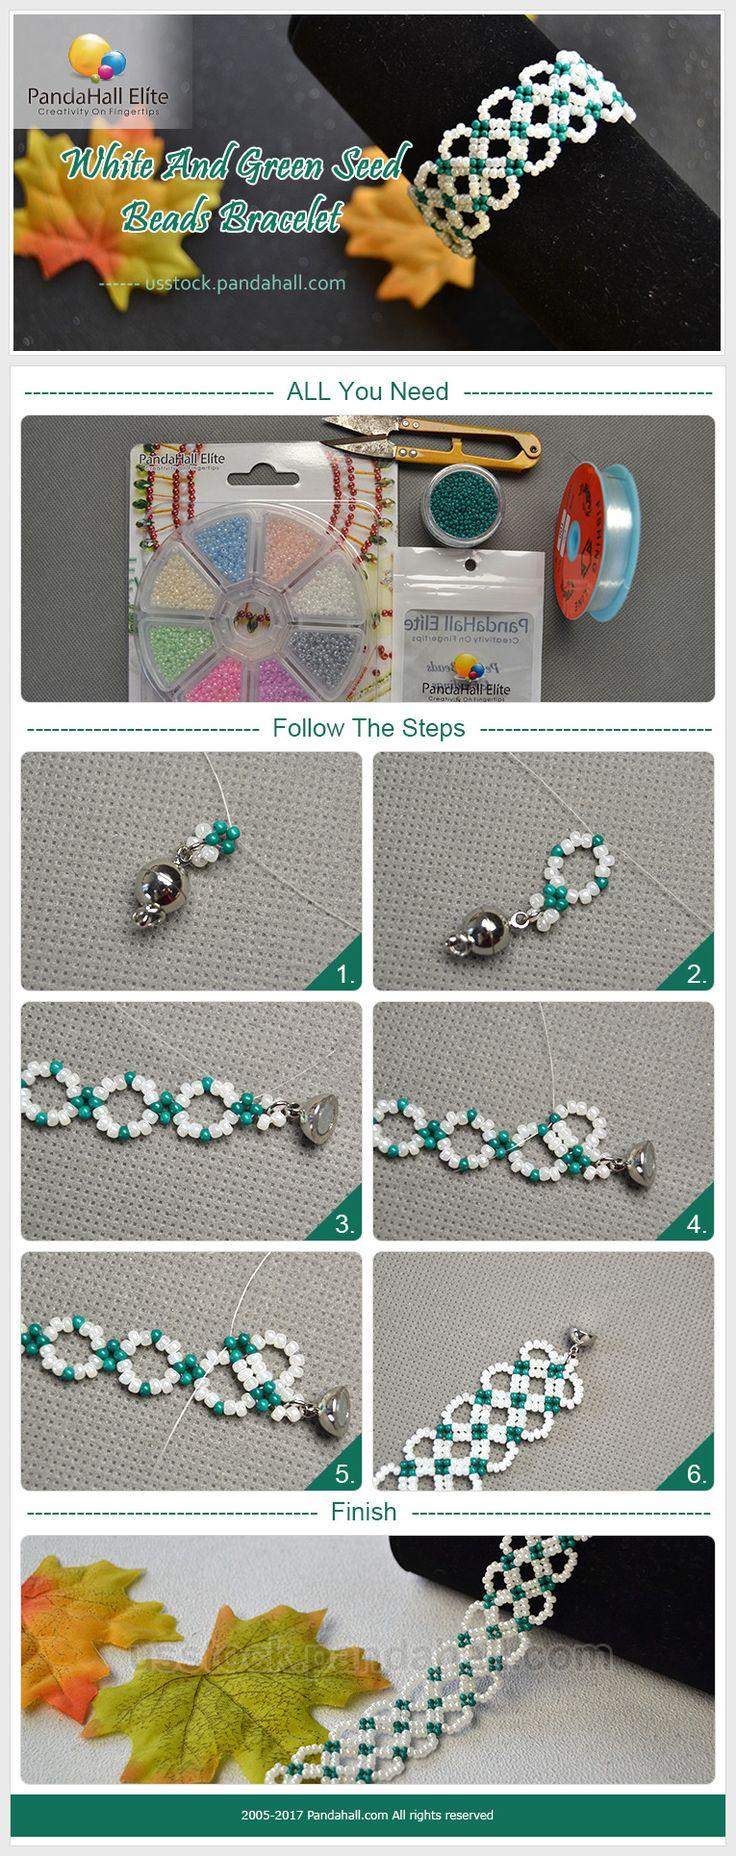 PandaHall Elite 120PCS Nickel Free Iron Earring Hooks Multi Colored Earring Making Supplies in One Box~